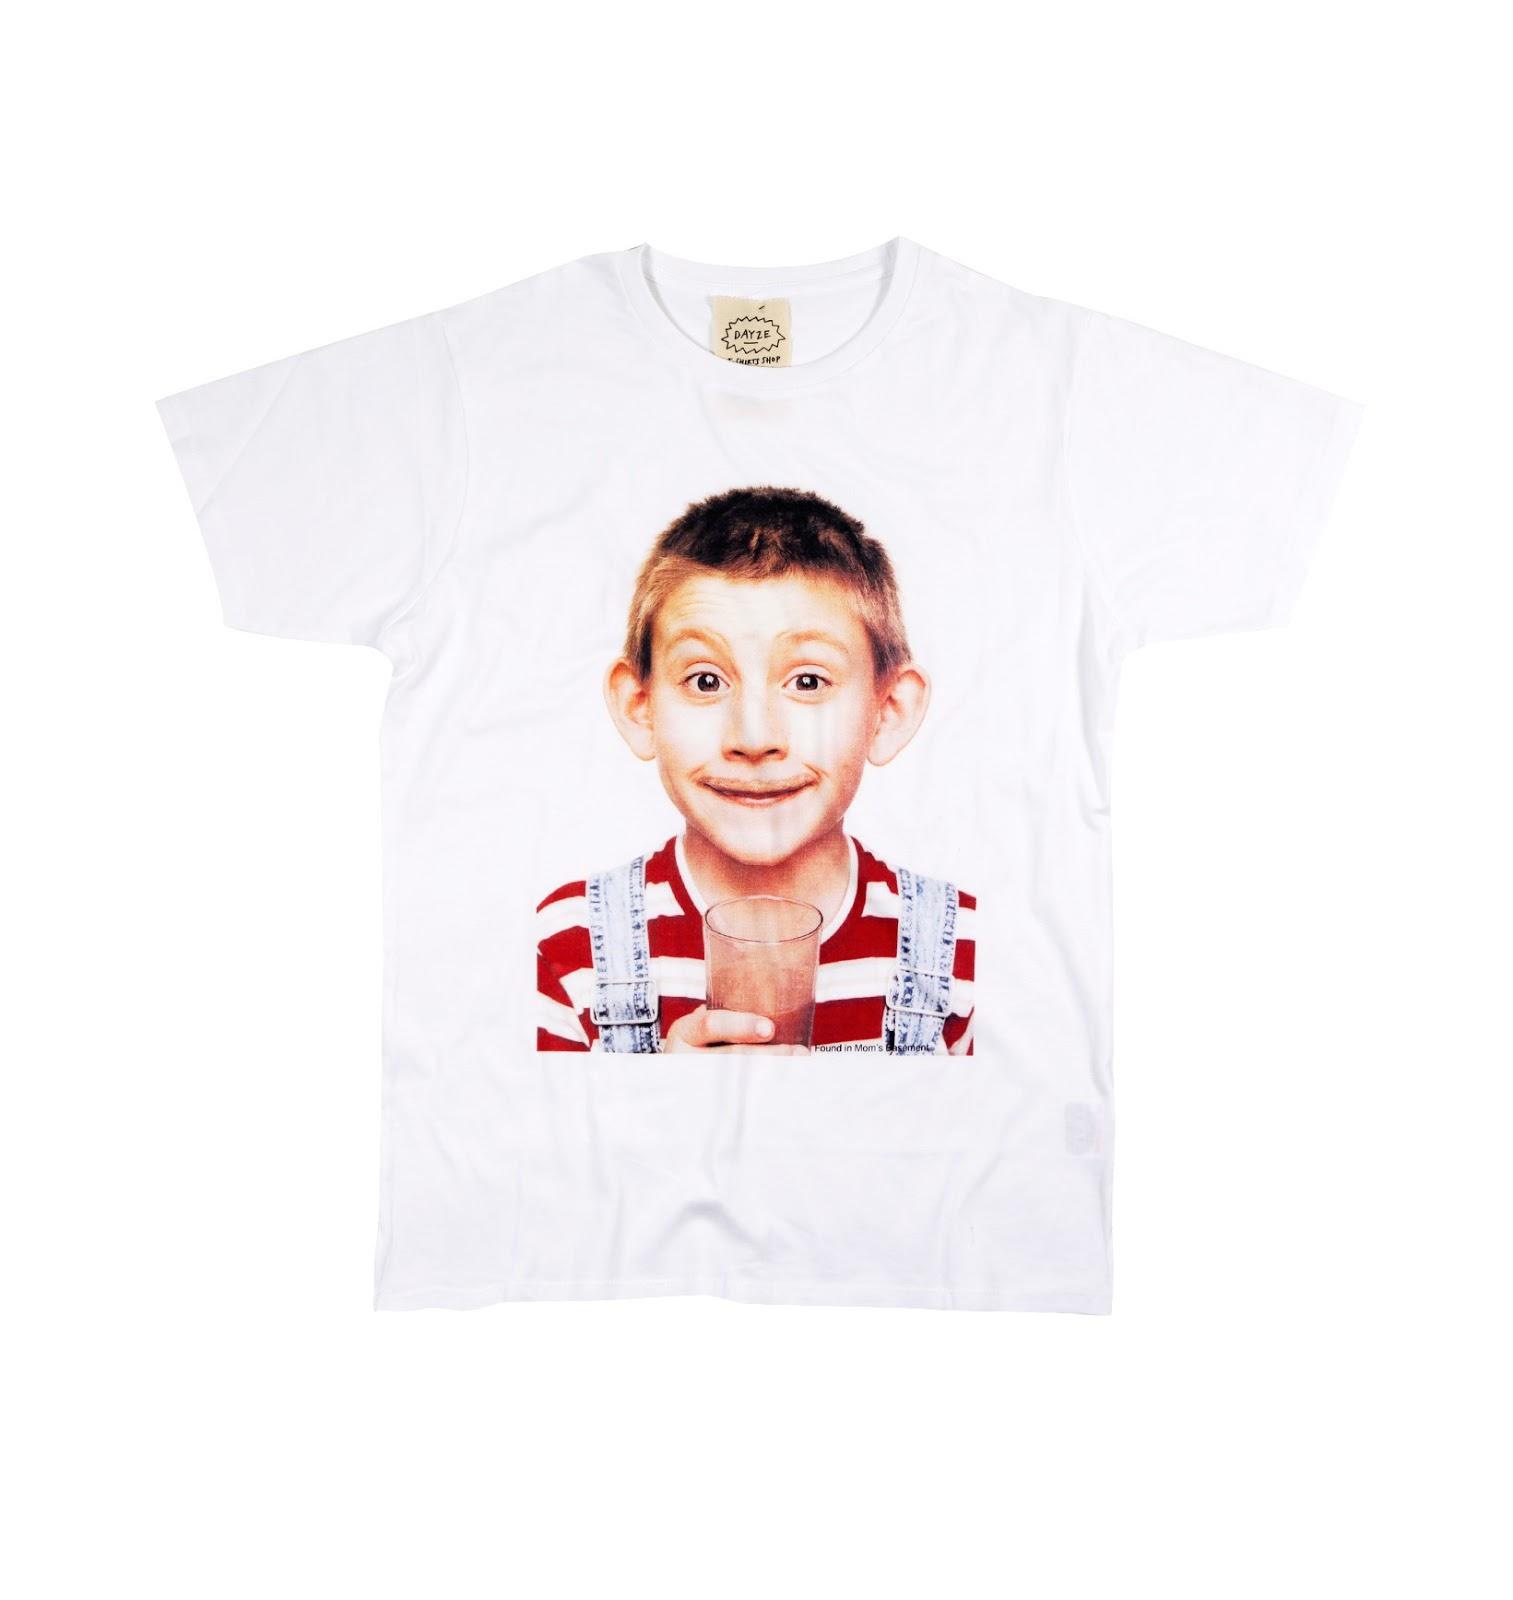 https://grafitee.es/s/camisetas/1008-t-shirt-dewee-milk.html